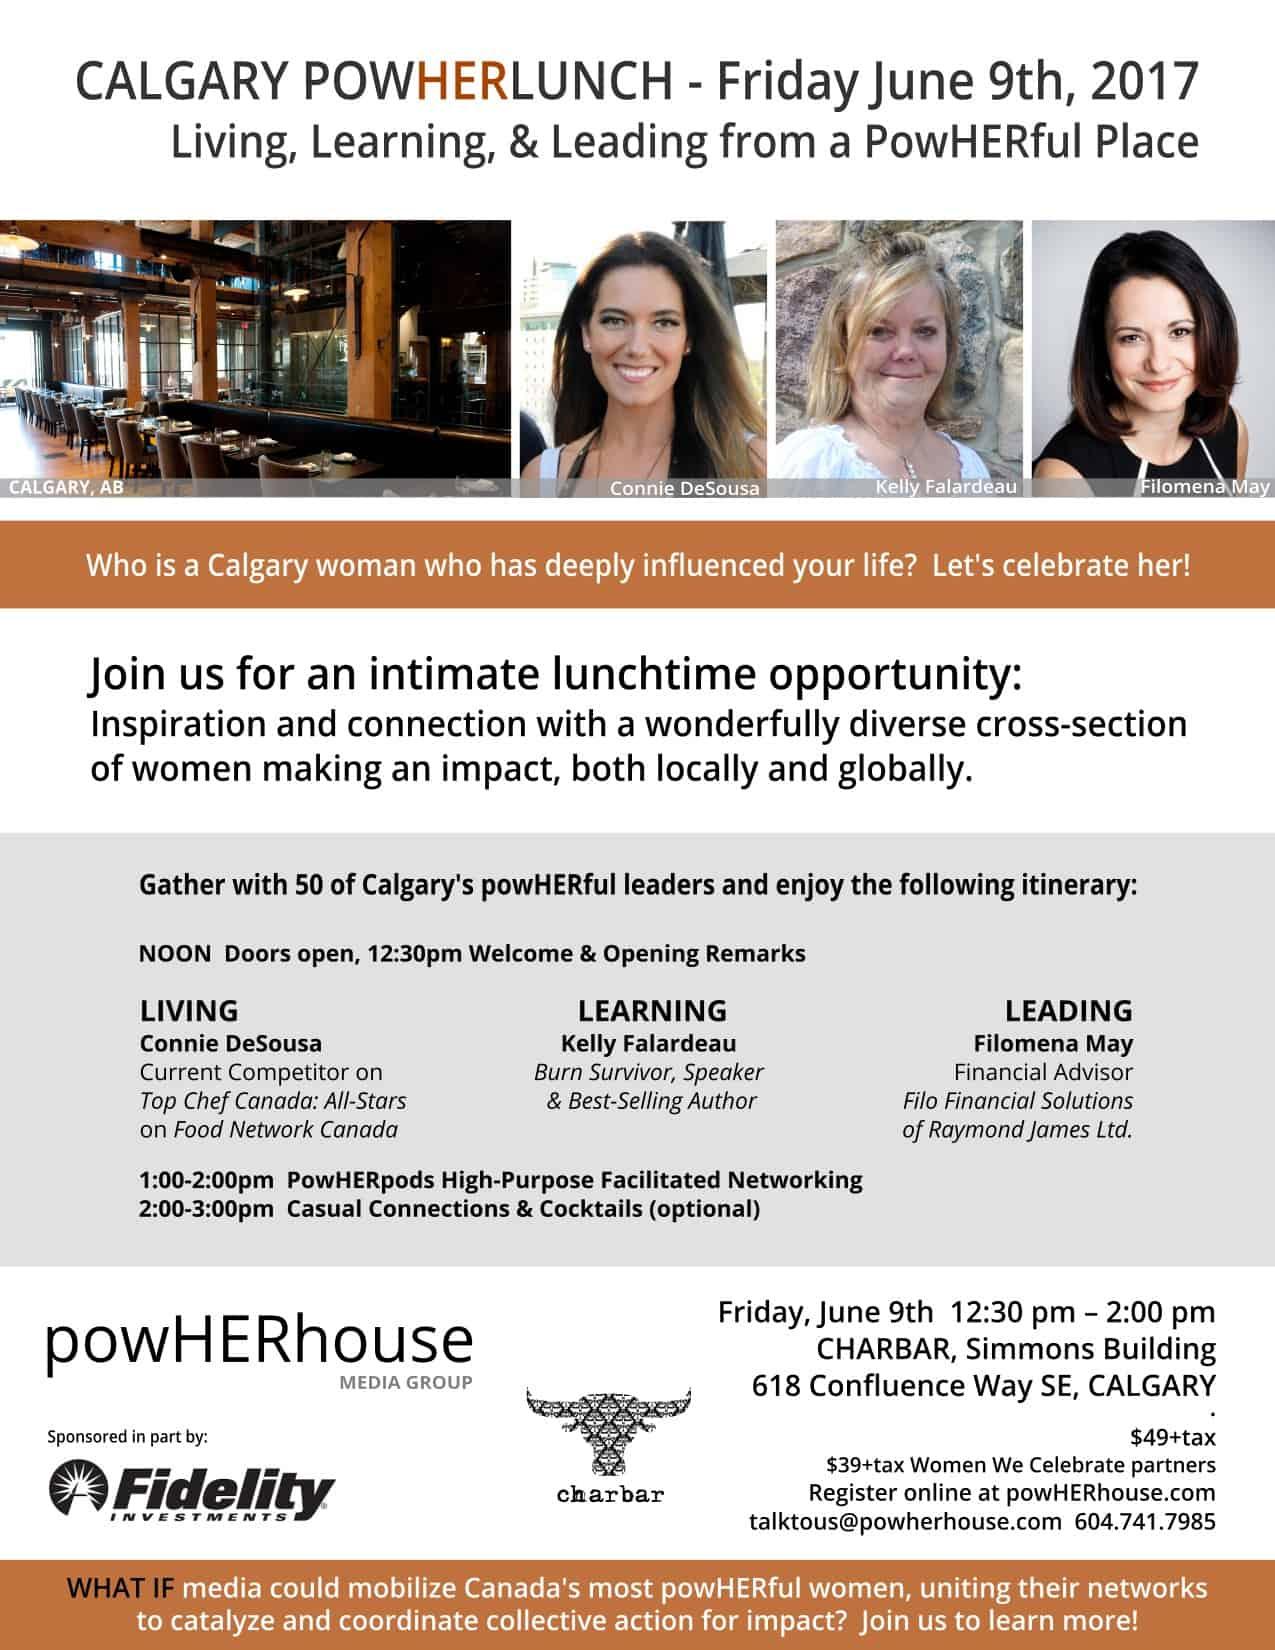 PowHERhouse Lunch – Friday June 9 in Calgary